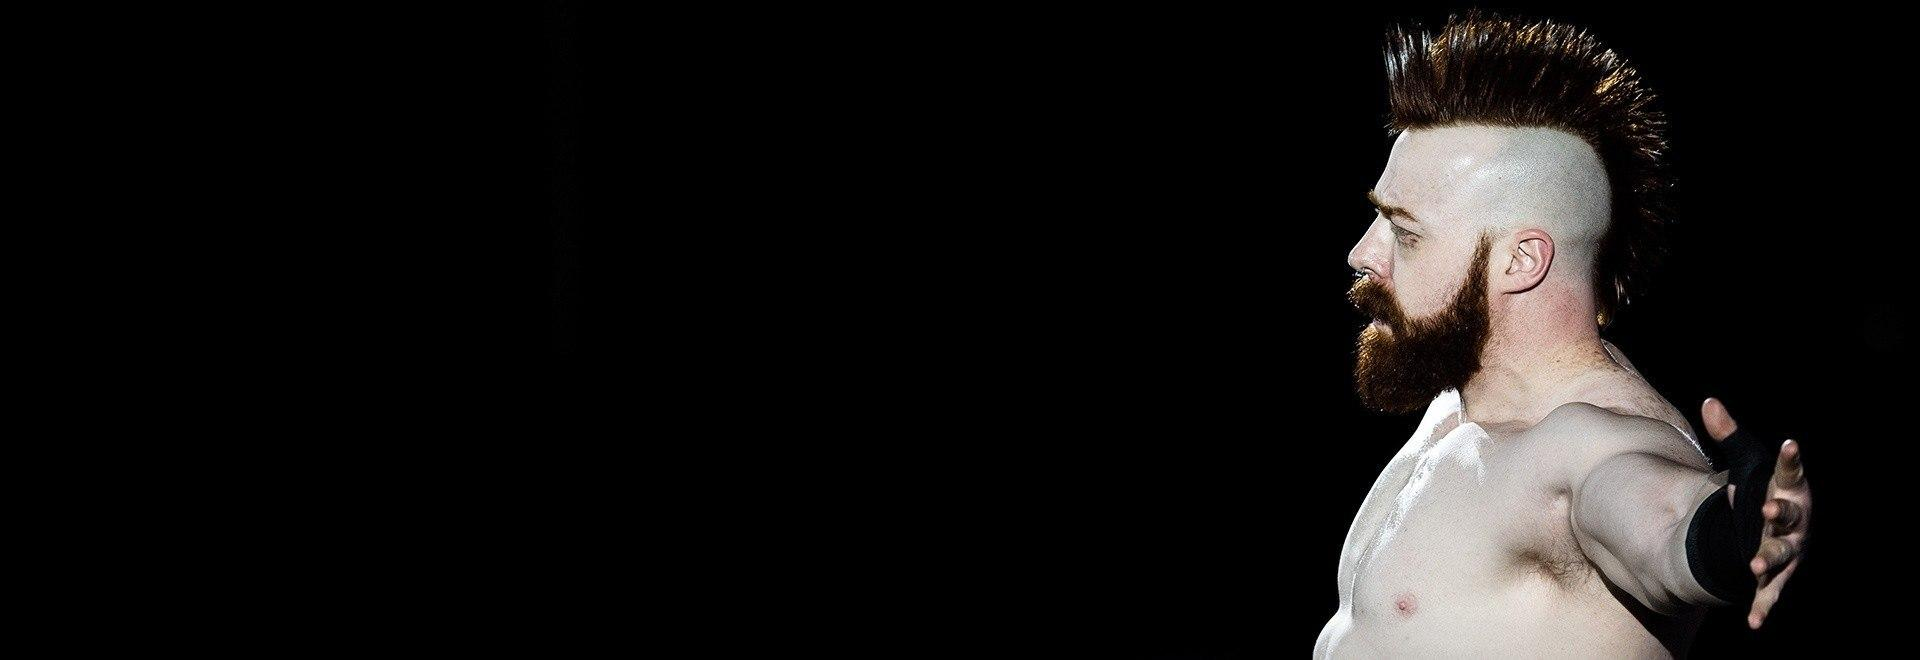 Ep. 248